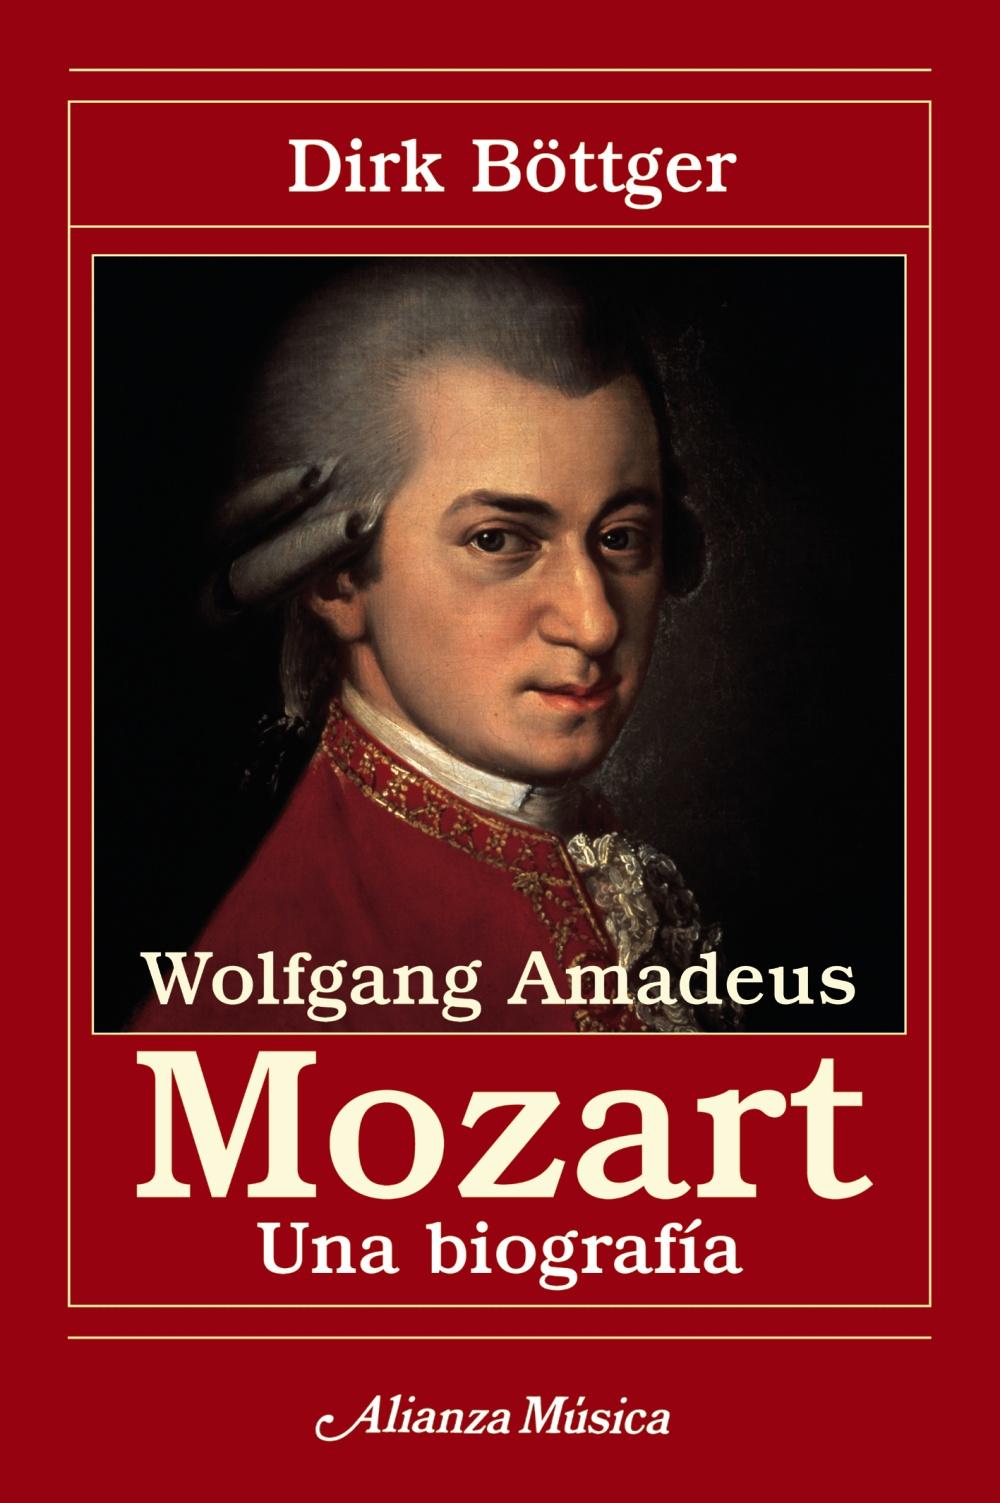 Wolfgang Amadeus Mozart: Una Biografia por Dirk Bötter